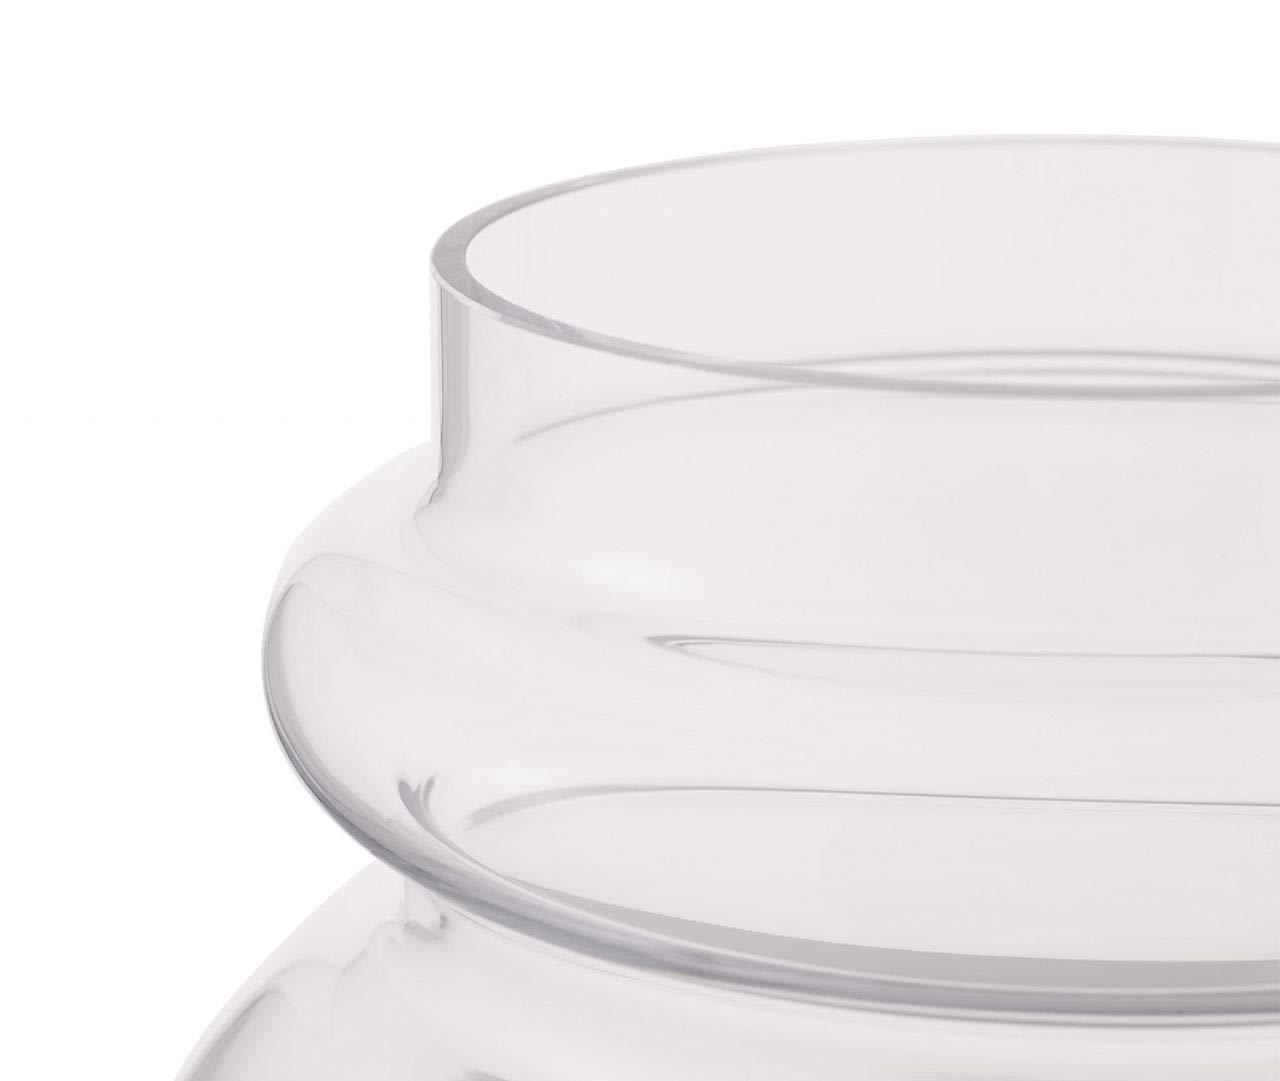 Tivoli - Balloon Vase - Blumenvase - klar - Höhe 19 cm